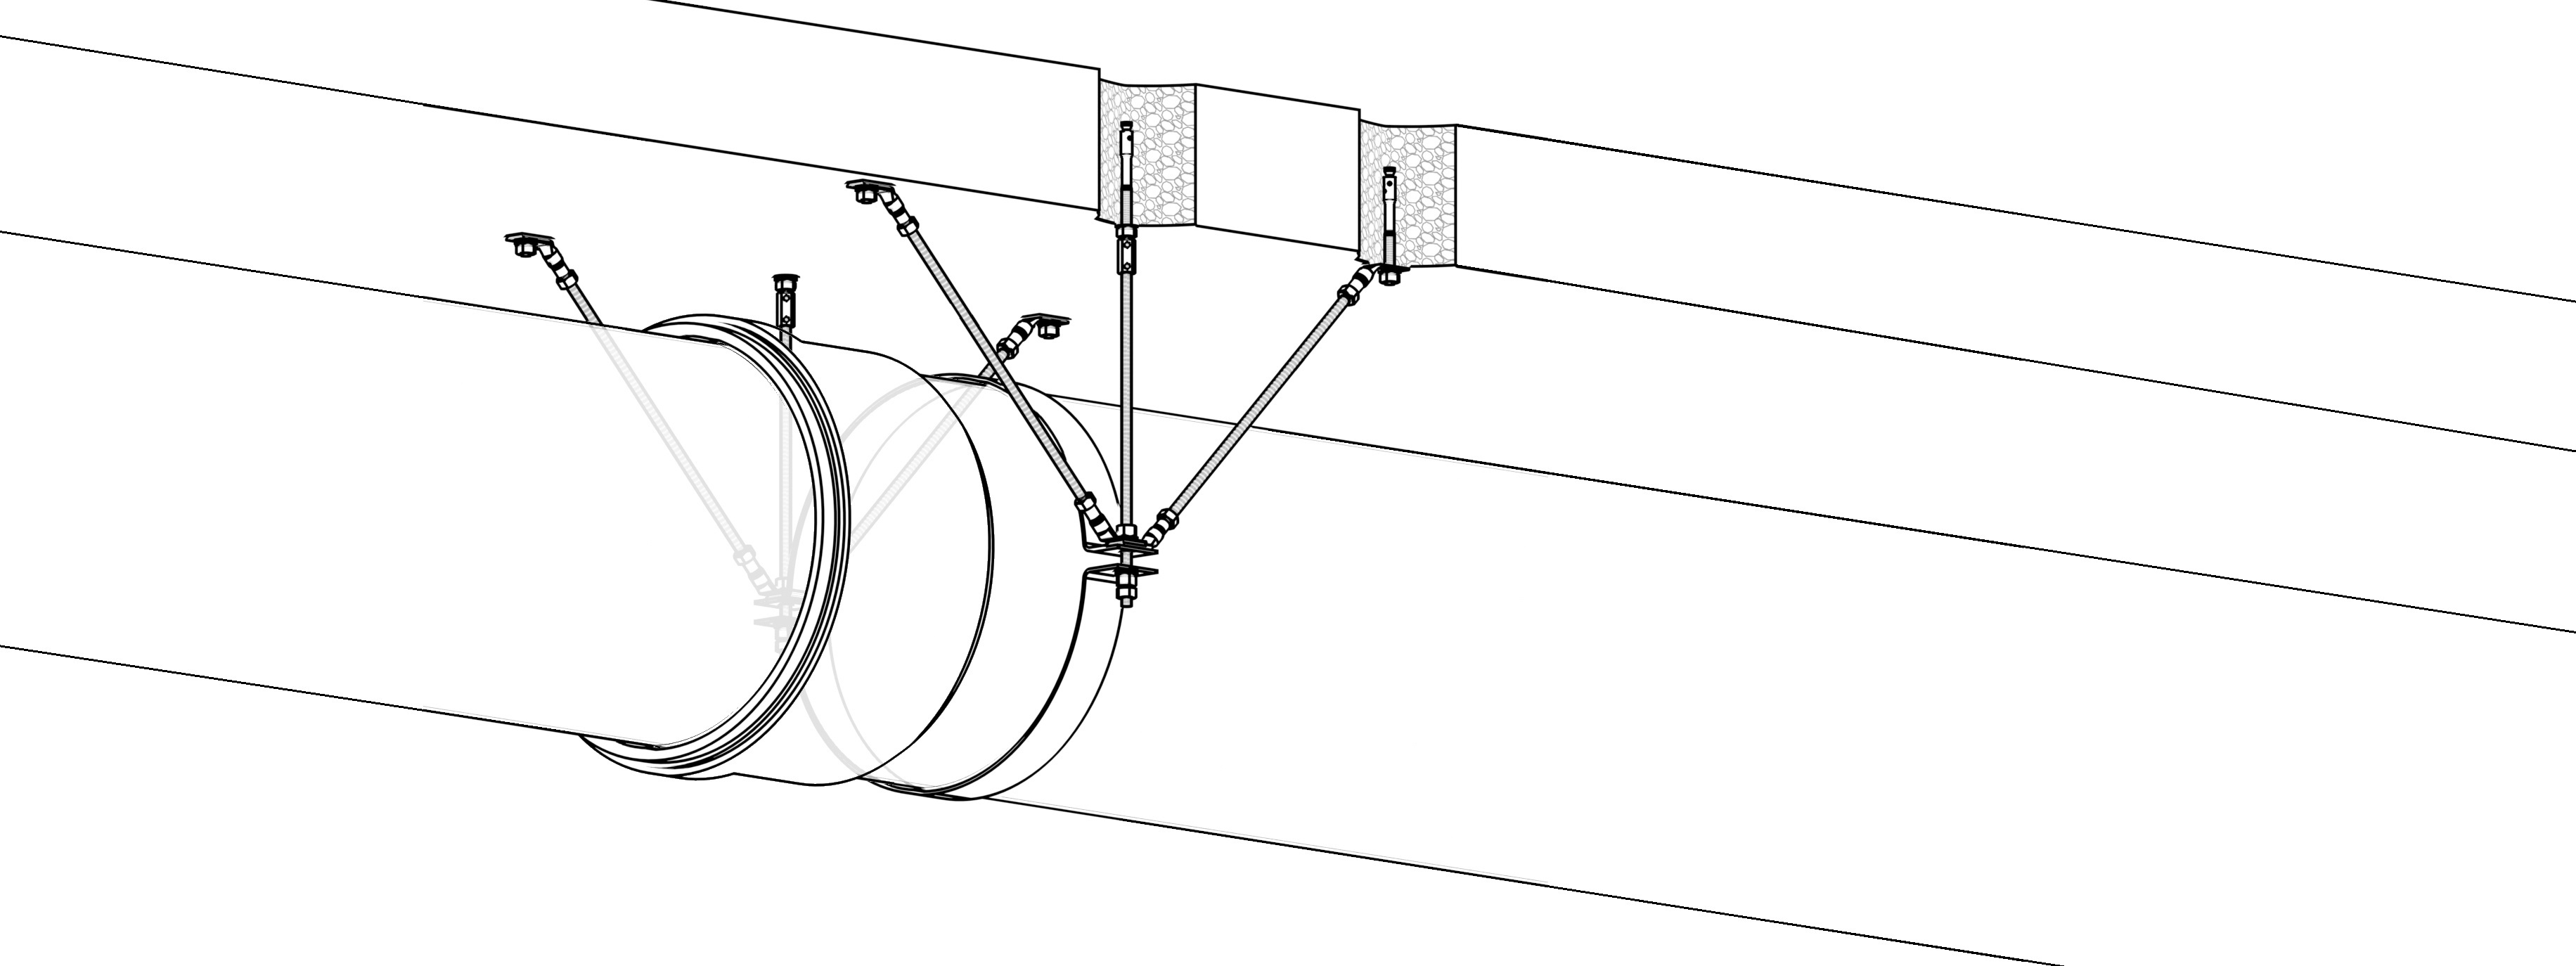 6-Punkt Festpunkt horizontal (6PH-FP)